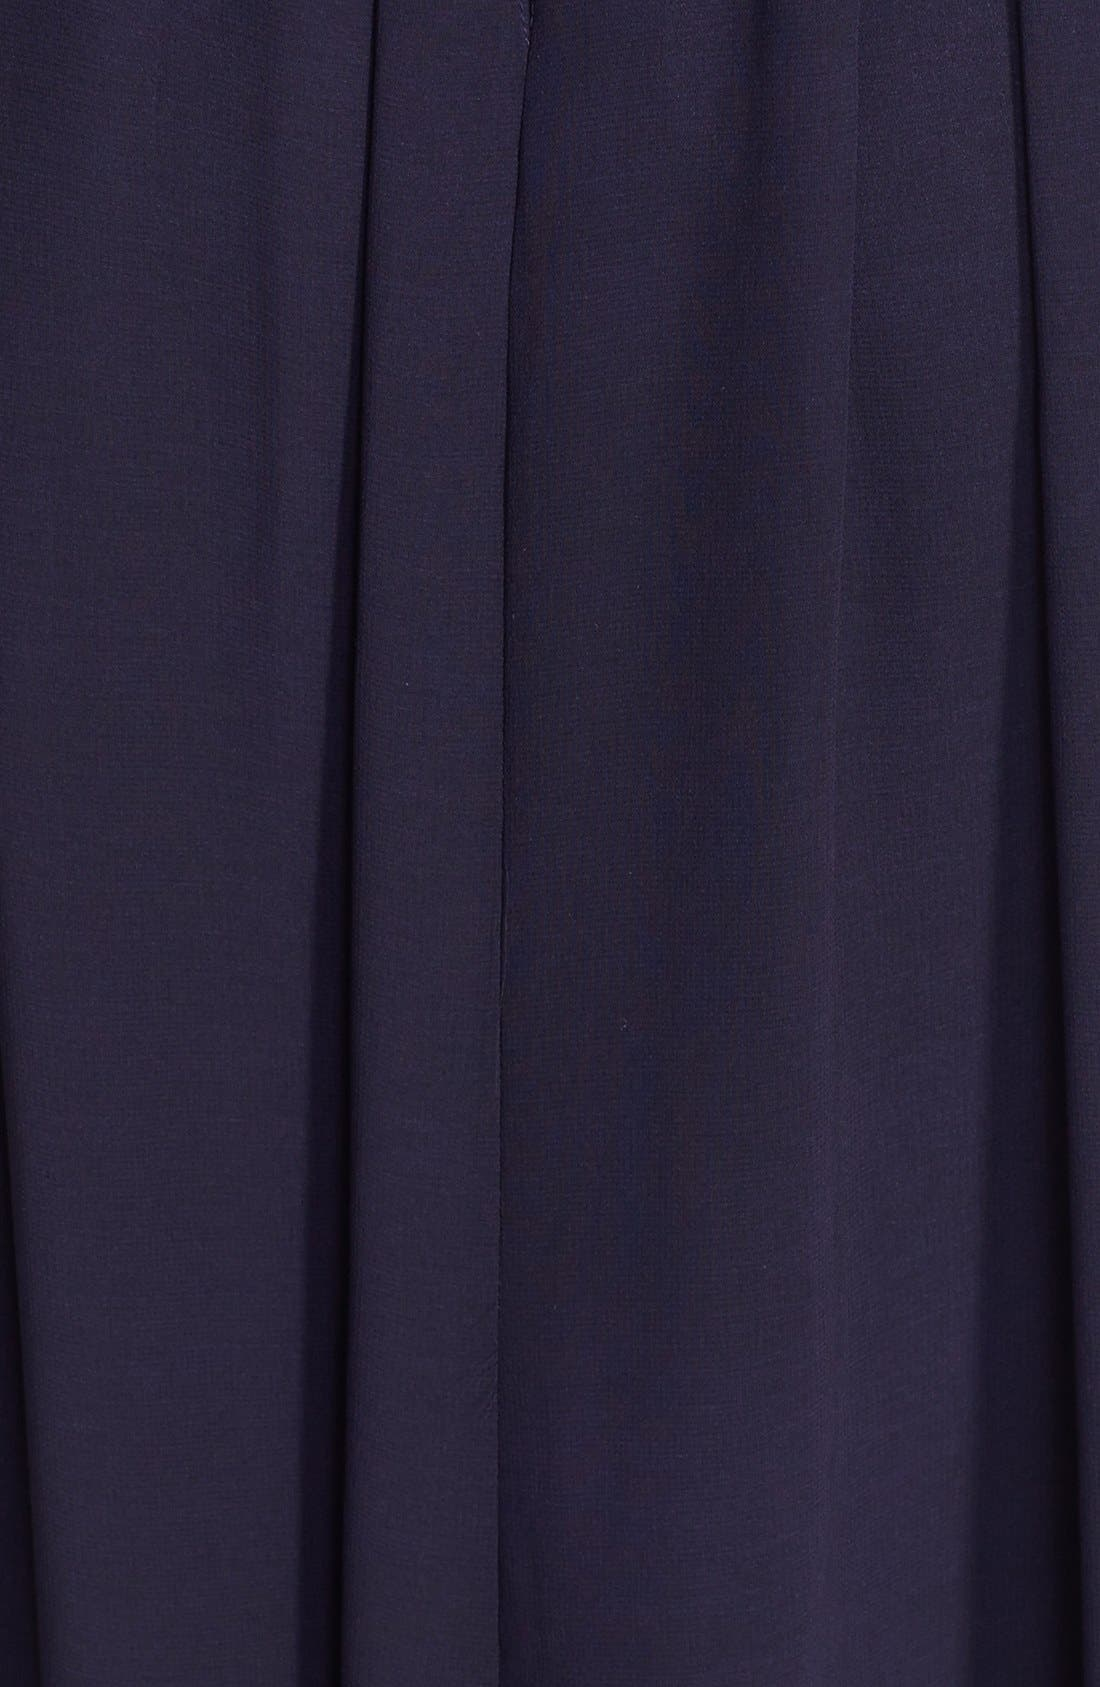 Alternate Image 3  - ERIN erin fetherston 'Isabelle' Print Strapless Gown